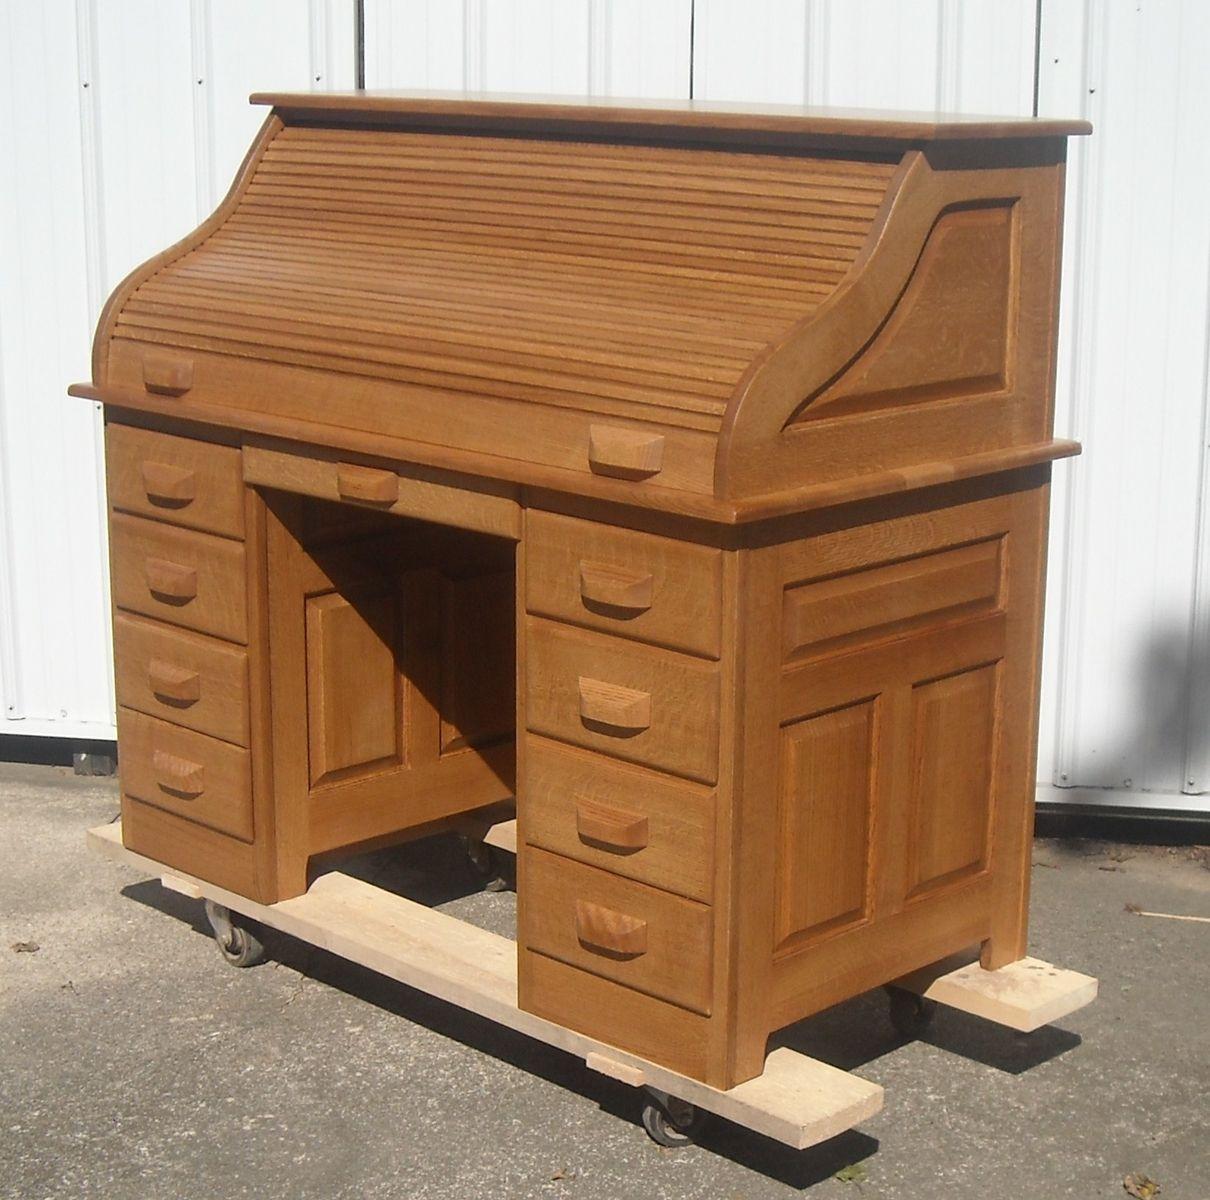 Best Built Furniture: Hand Crafted Quarter Sawed Oak Roll Top Desk By Tom Kies